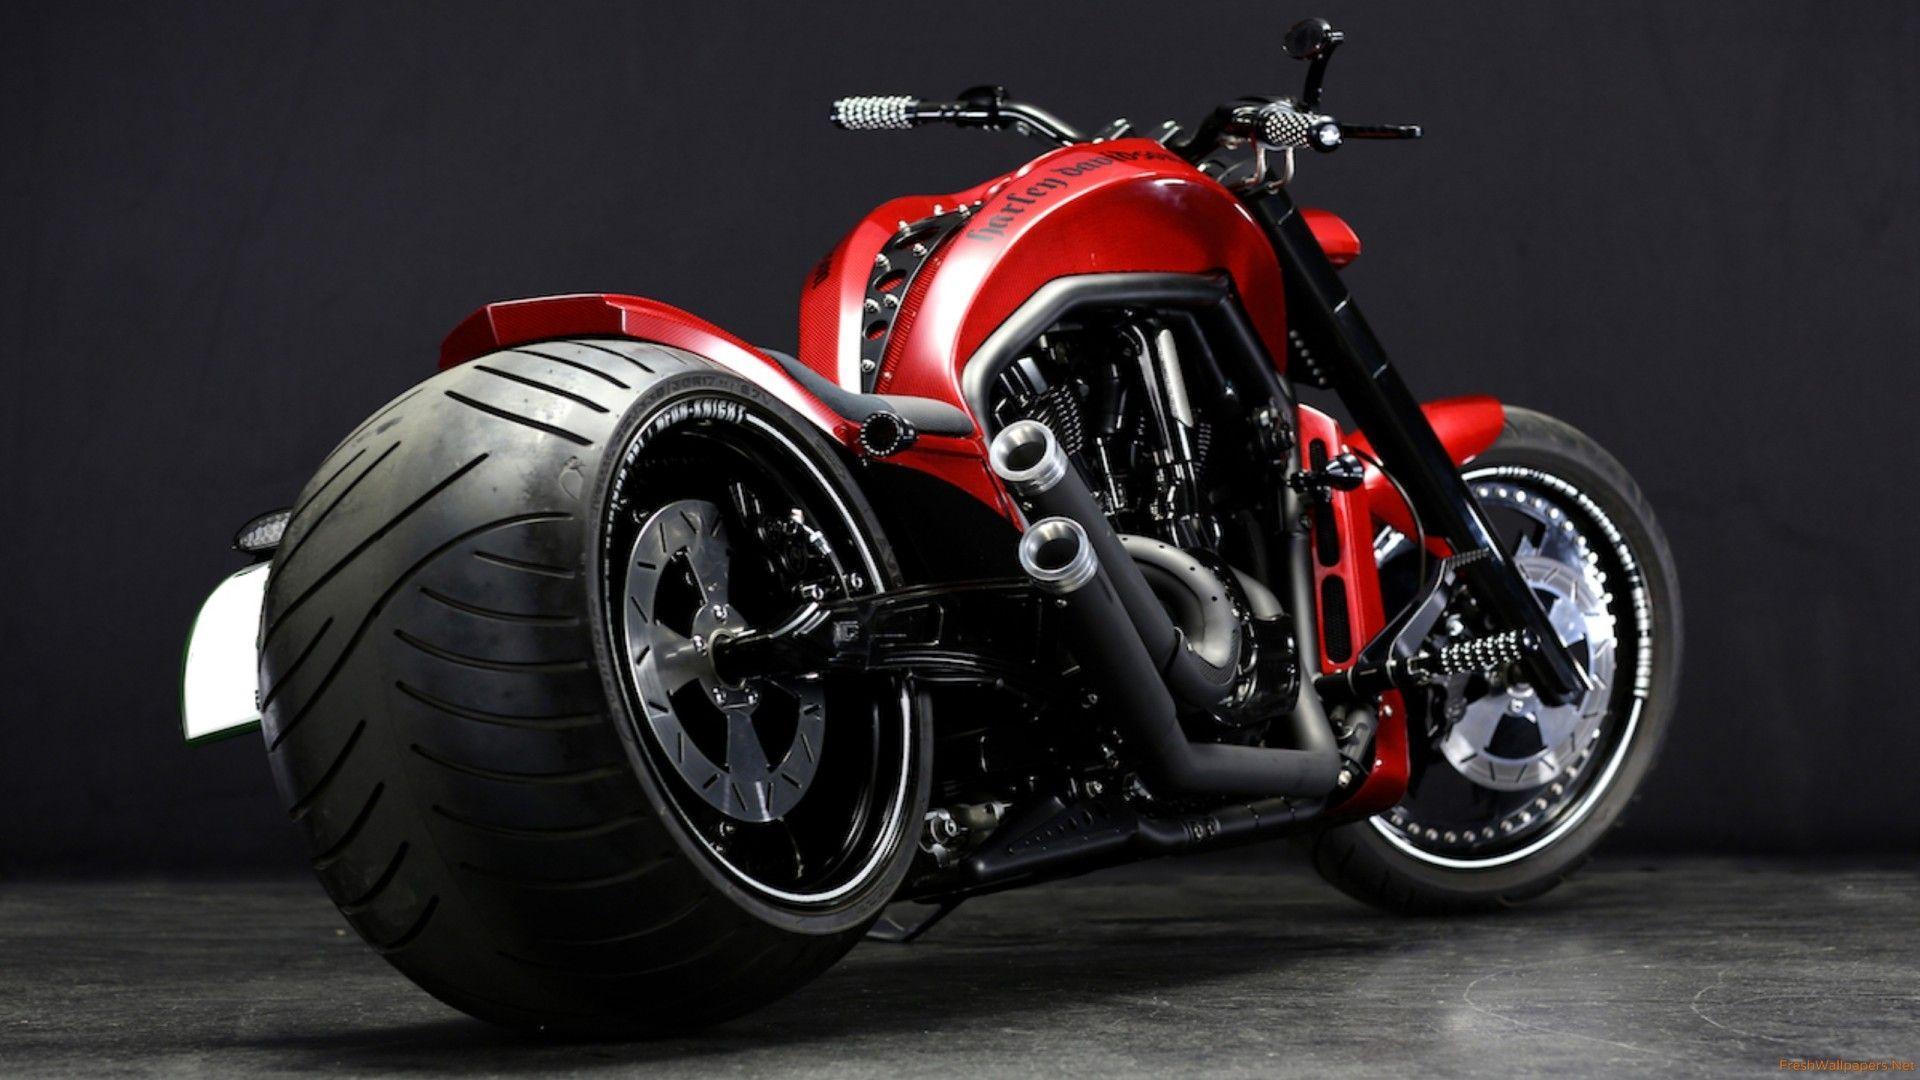 Harley Davidson wallpapers | Freshwallpapers